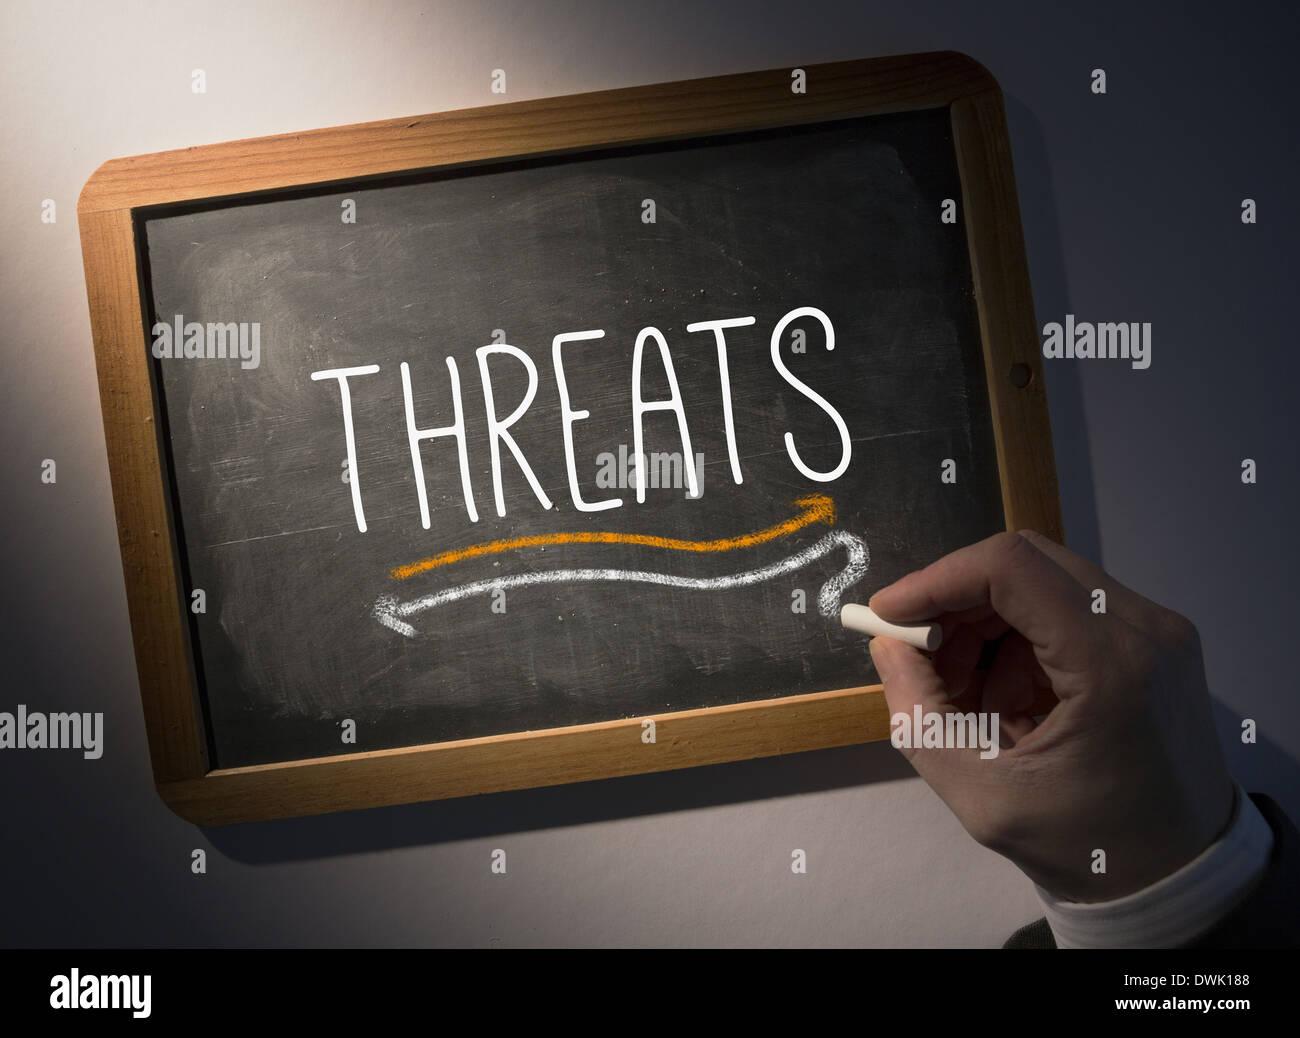 Hand writing Threats on chalkboard - Stock Image